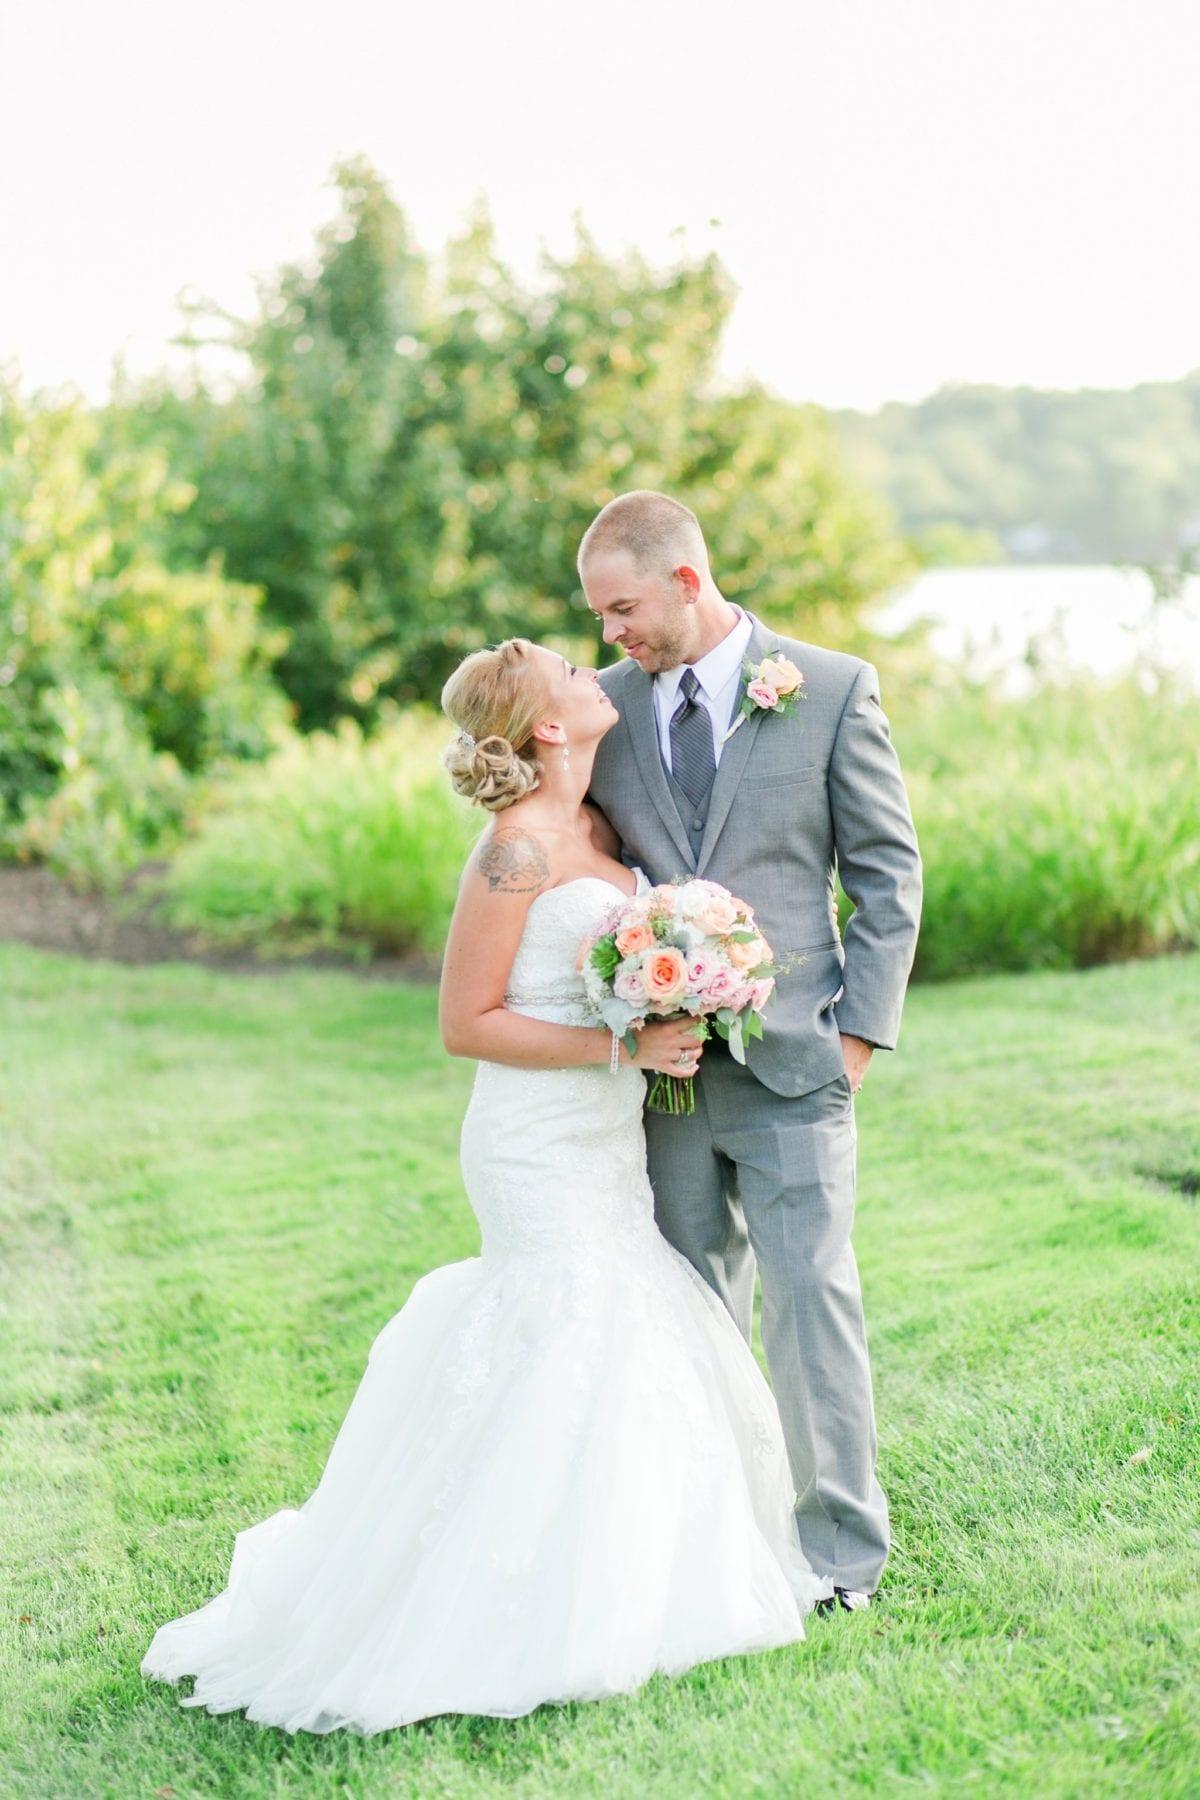 Waters Edge Wedding Photos Maryland Wedding Photographer Megan Kelsey Photography Katie & Conor-487.JPG